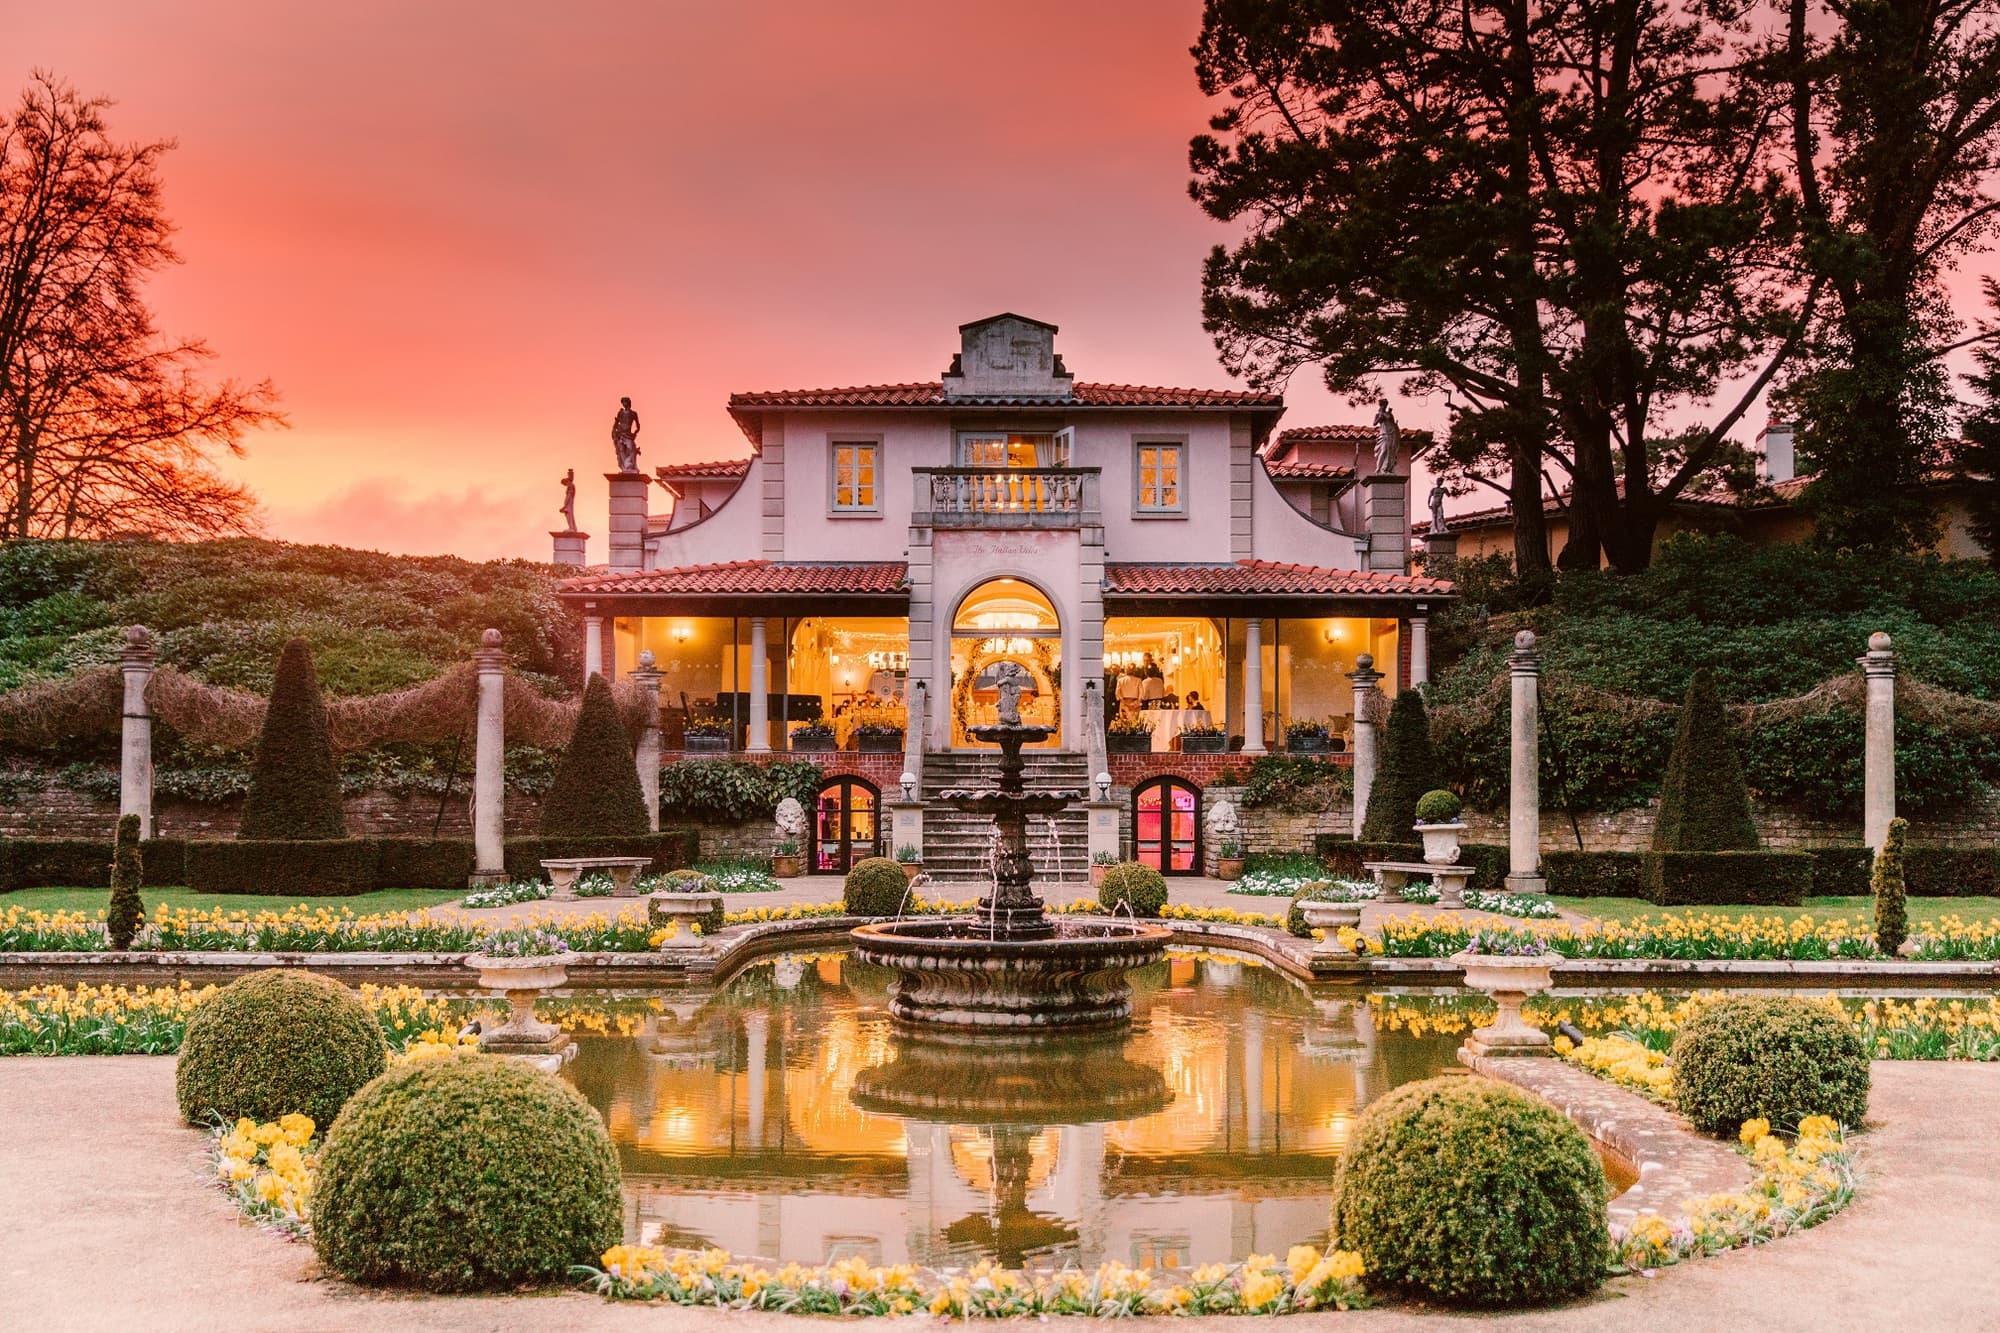 Sunset in The Italian Villa Garden - Bournemouth wedding venues